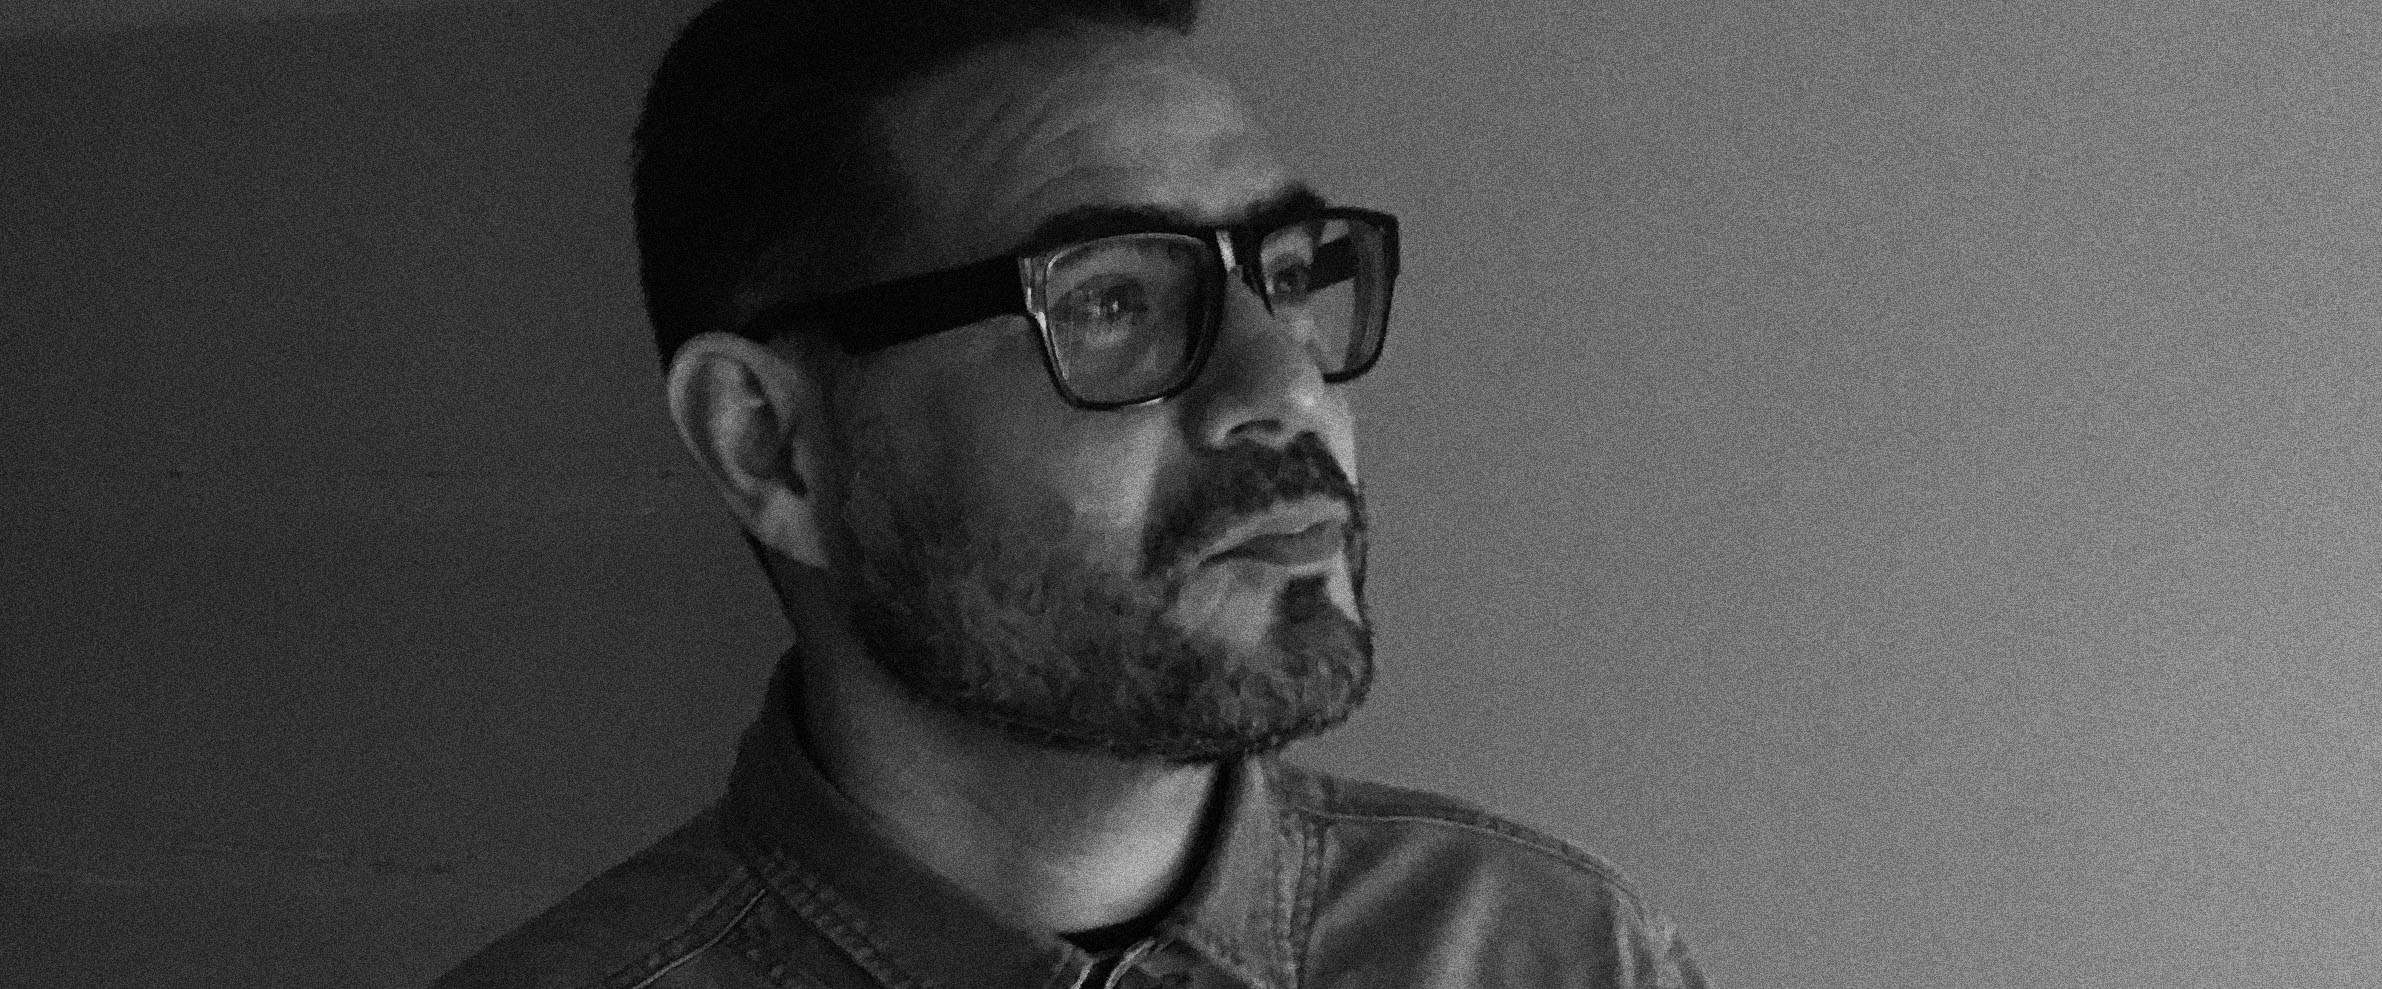 BlackVan director SAVA is on Produ.com!